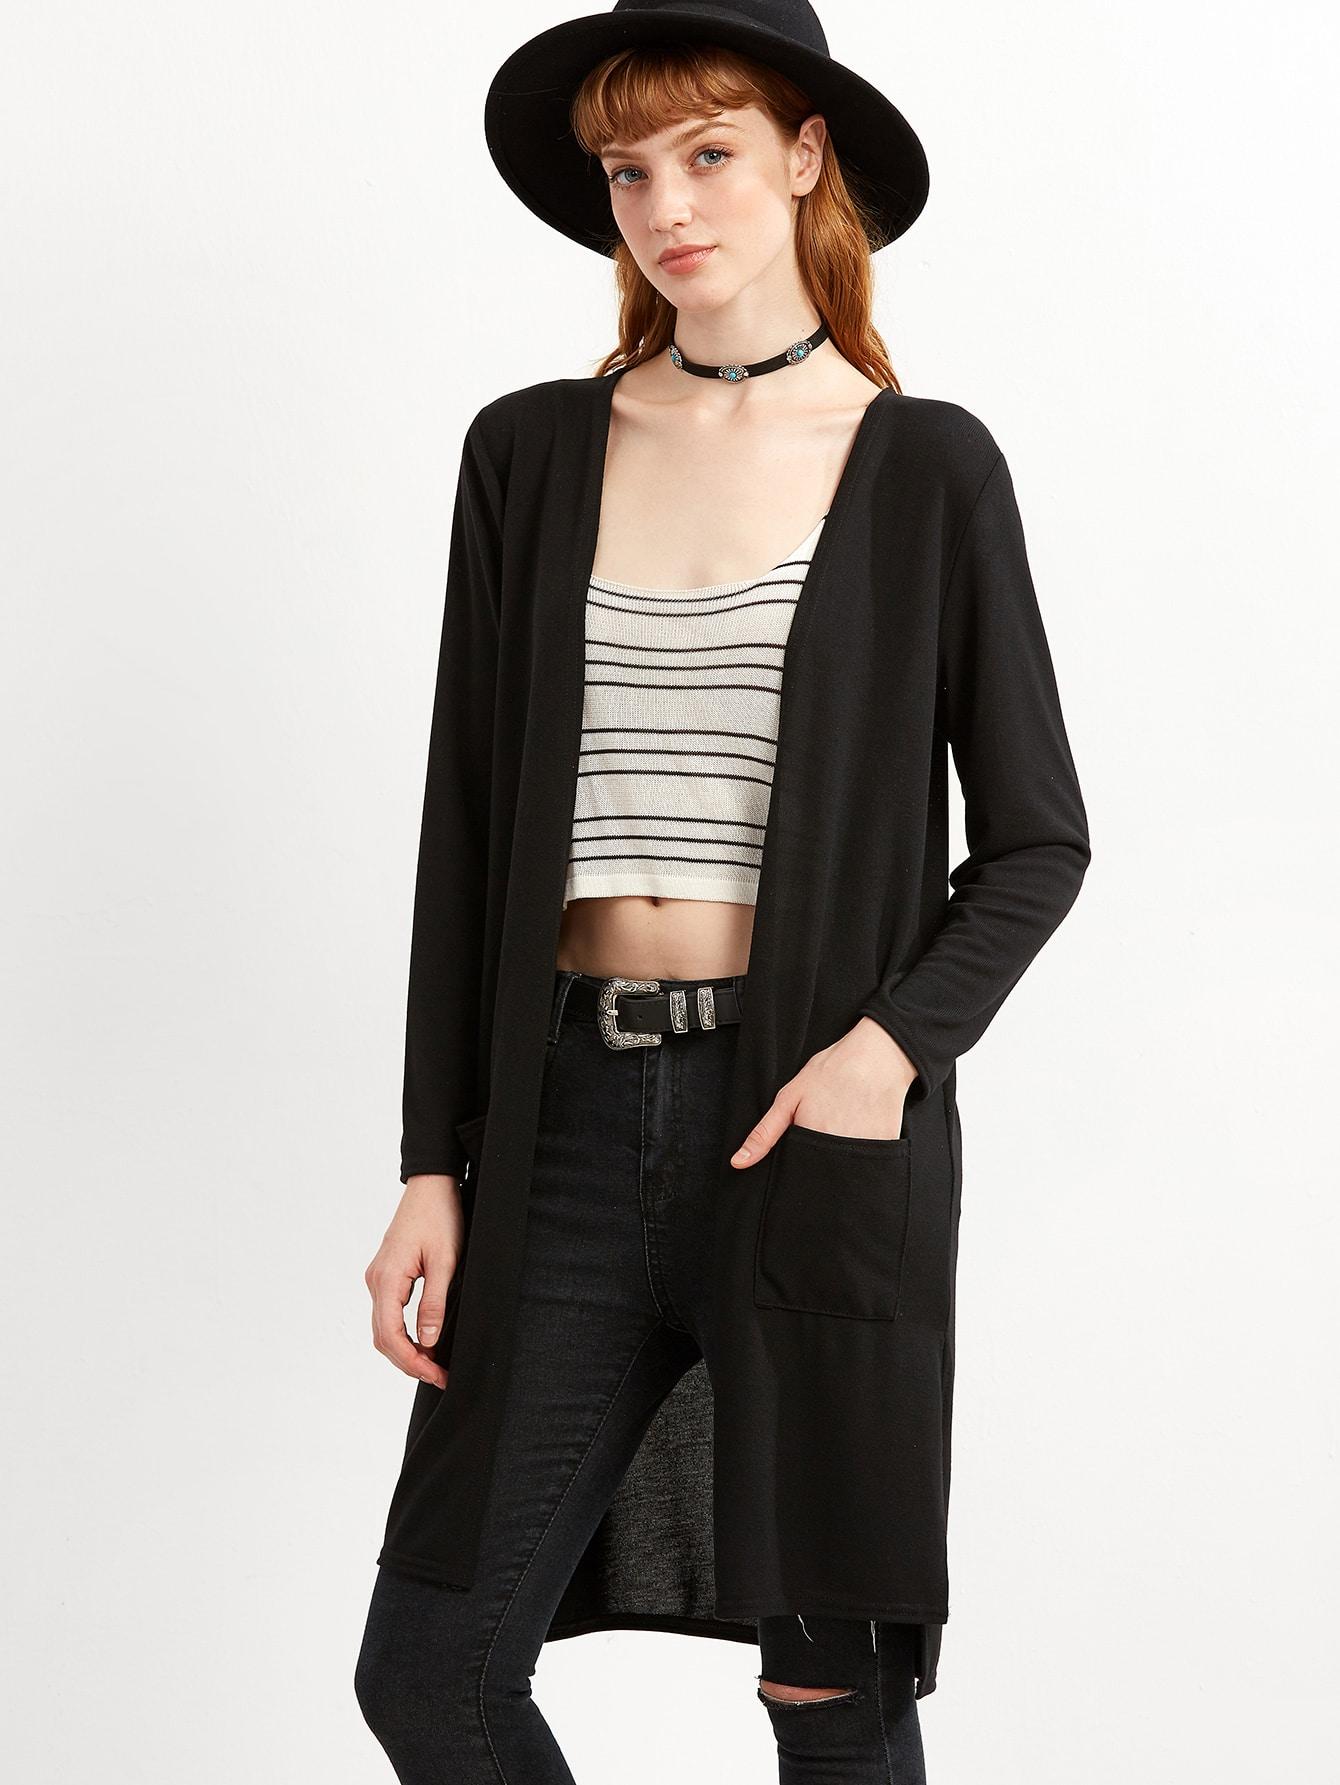 Black Slit Side High Low Pockets Cardigan sweater160916105